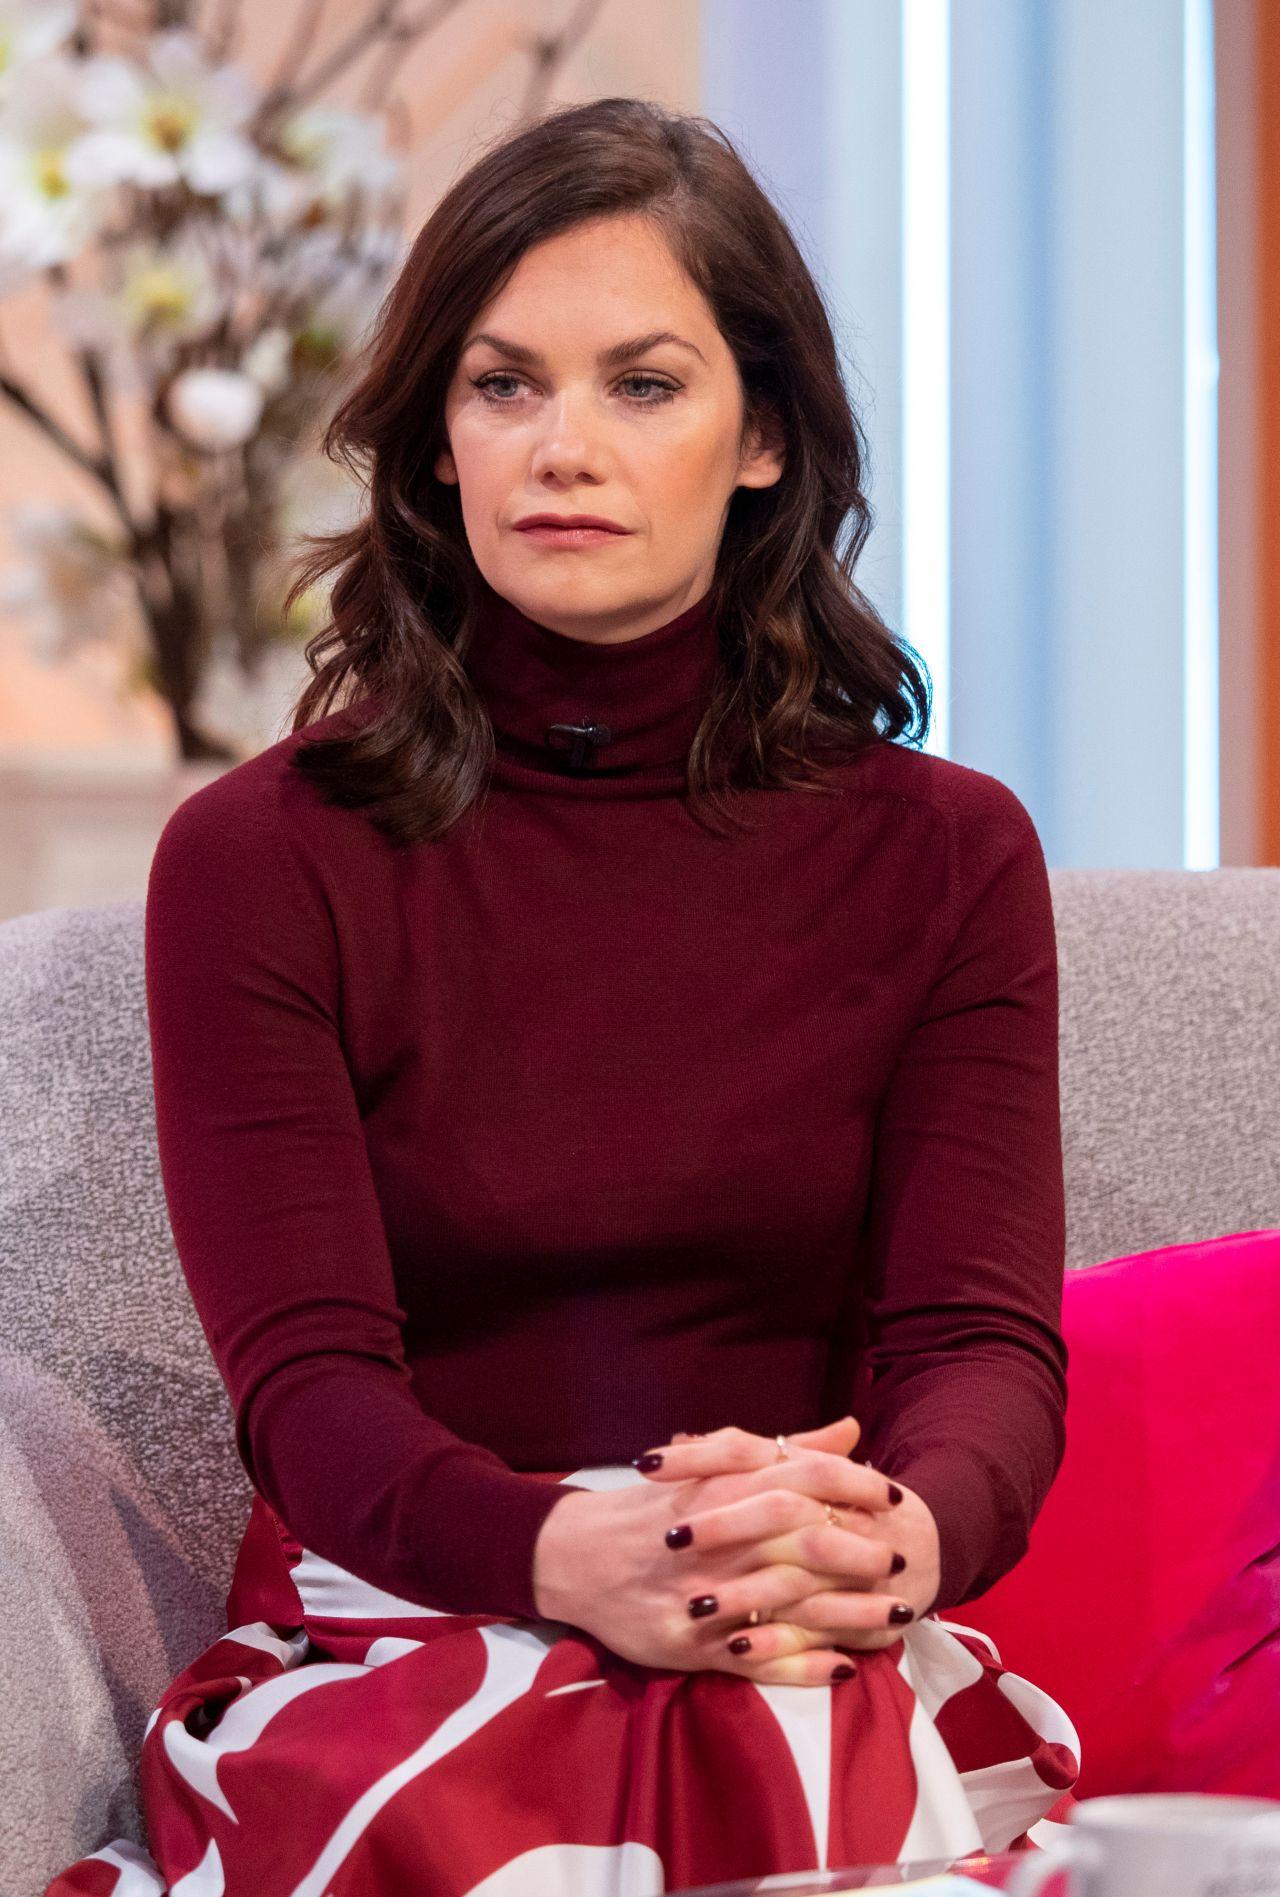 Lorraine TV Show In London 11/26/2018